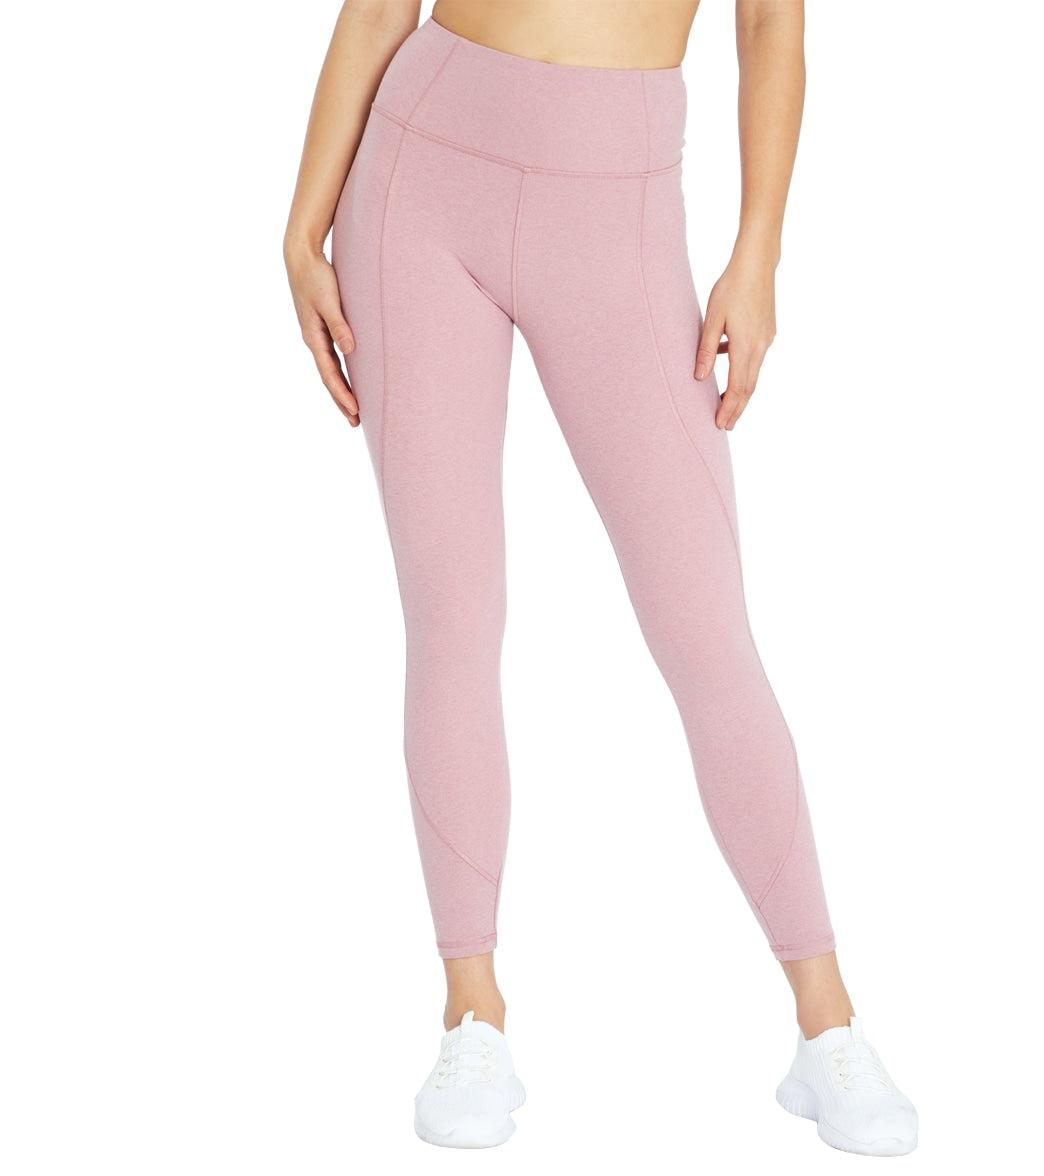 "Marika Women's Zola 25"" Yoga Leggings - Heather Rose Large Spandex Moisture Wicking"